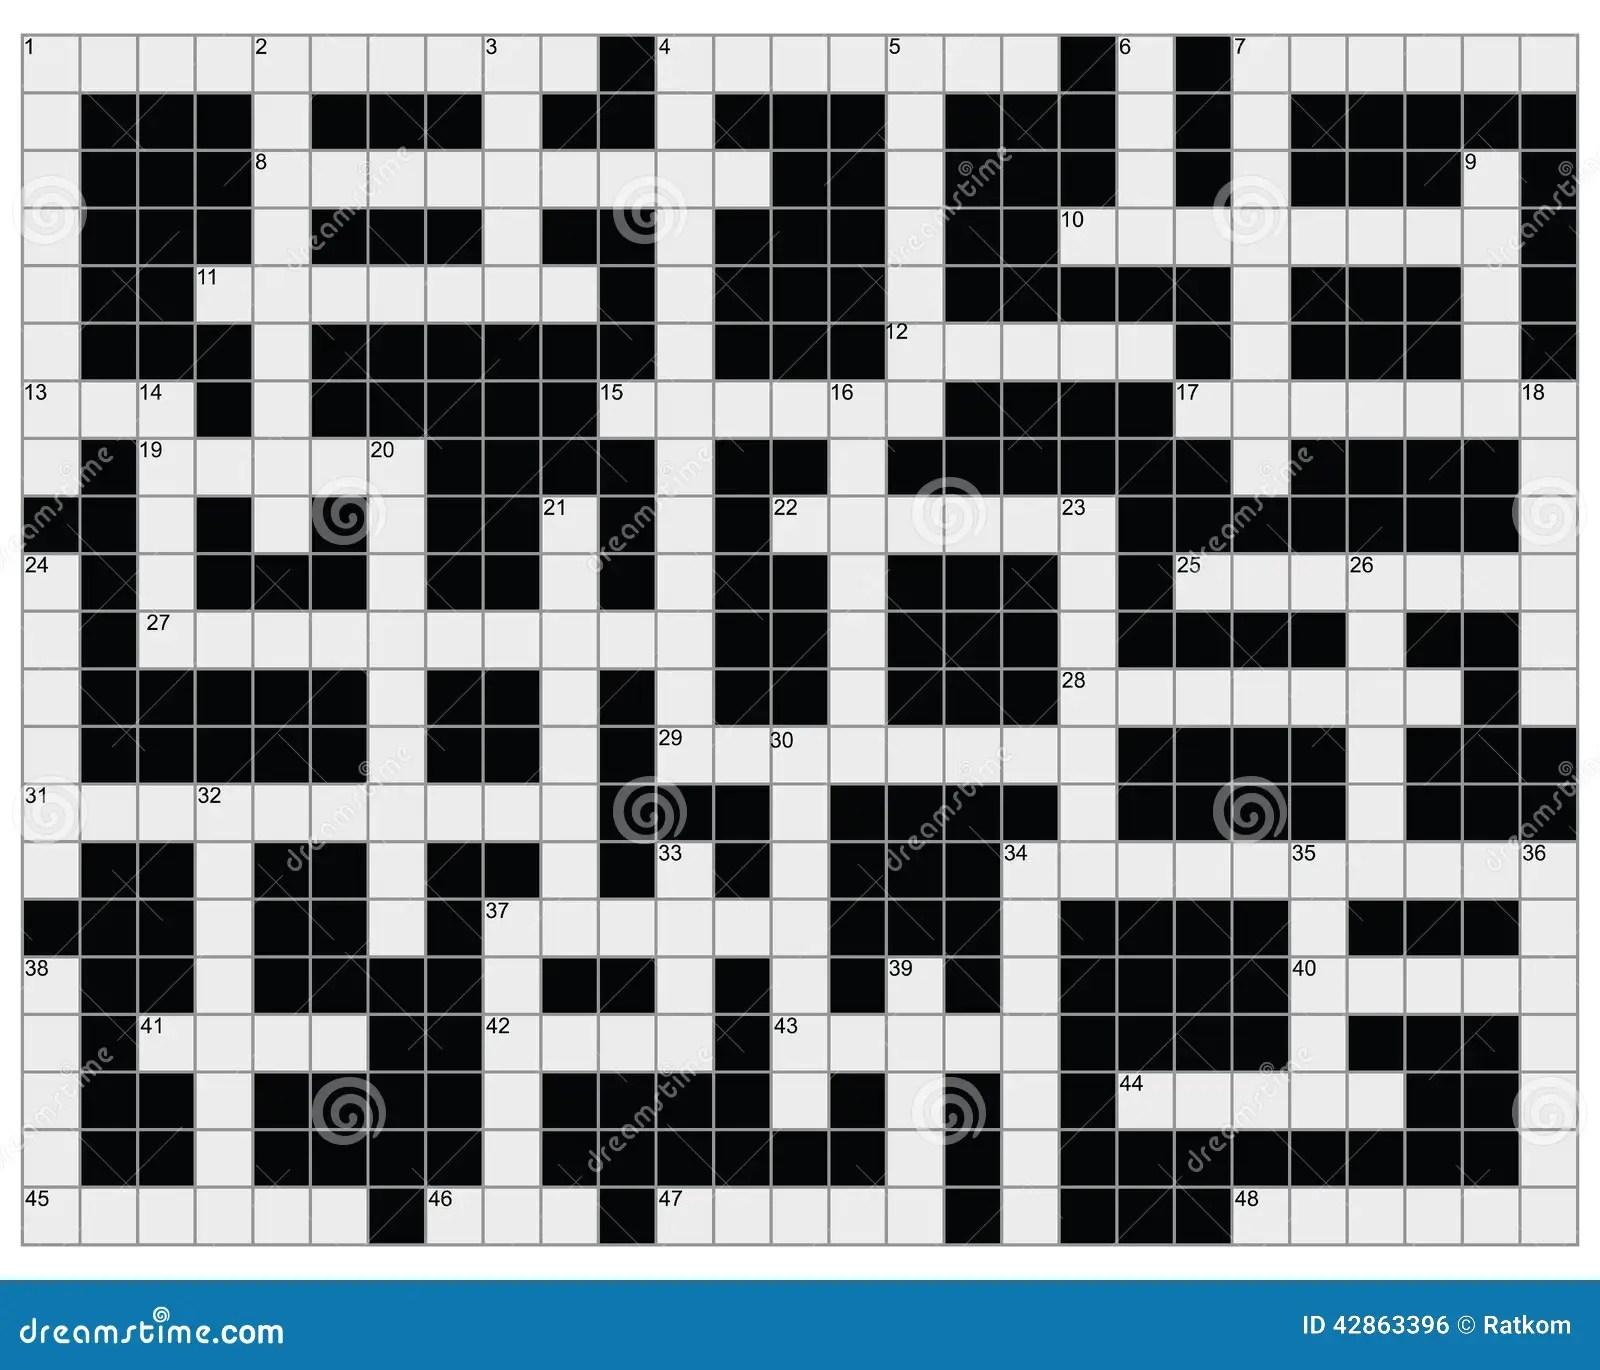 Crossword Puzzle Empty Crossword Puzzle Gallery   Jymba blank ...